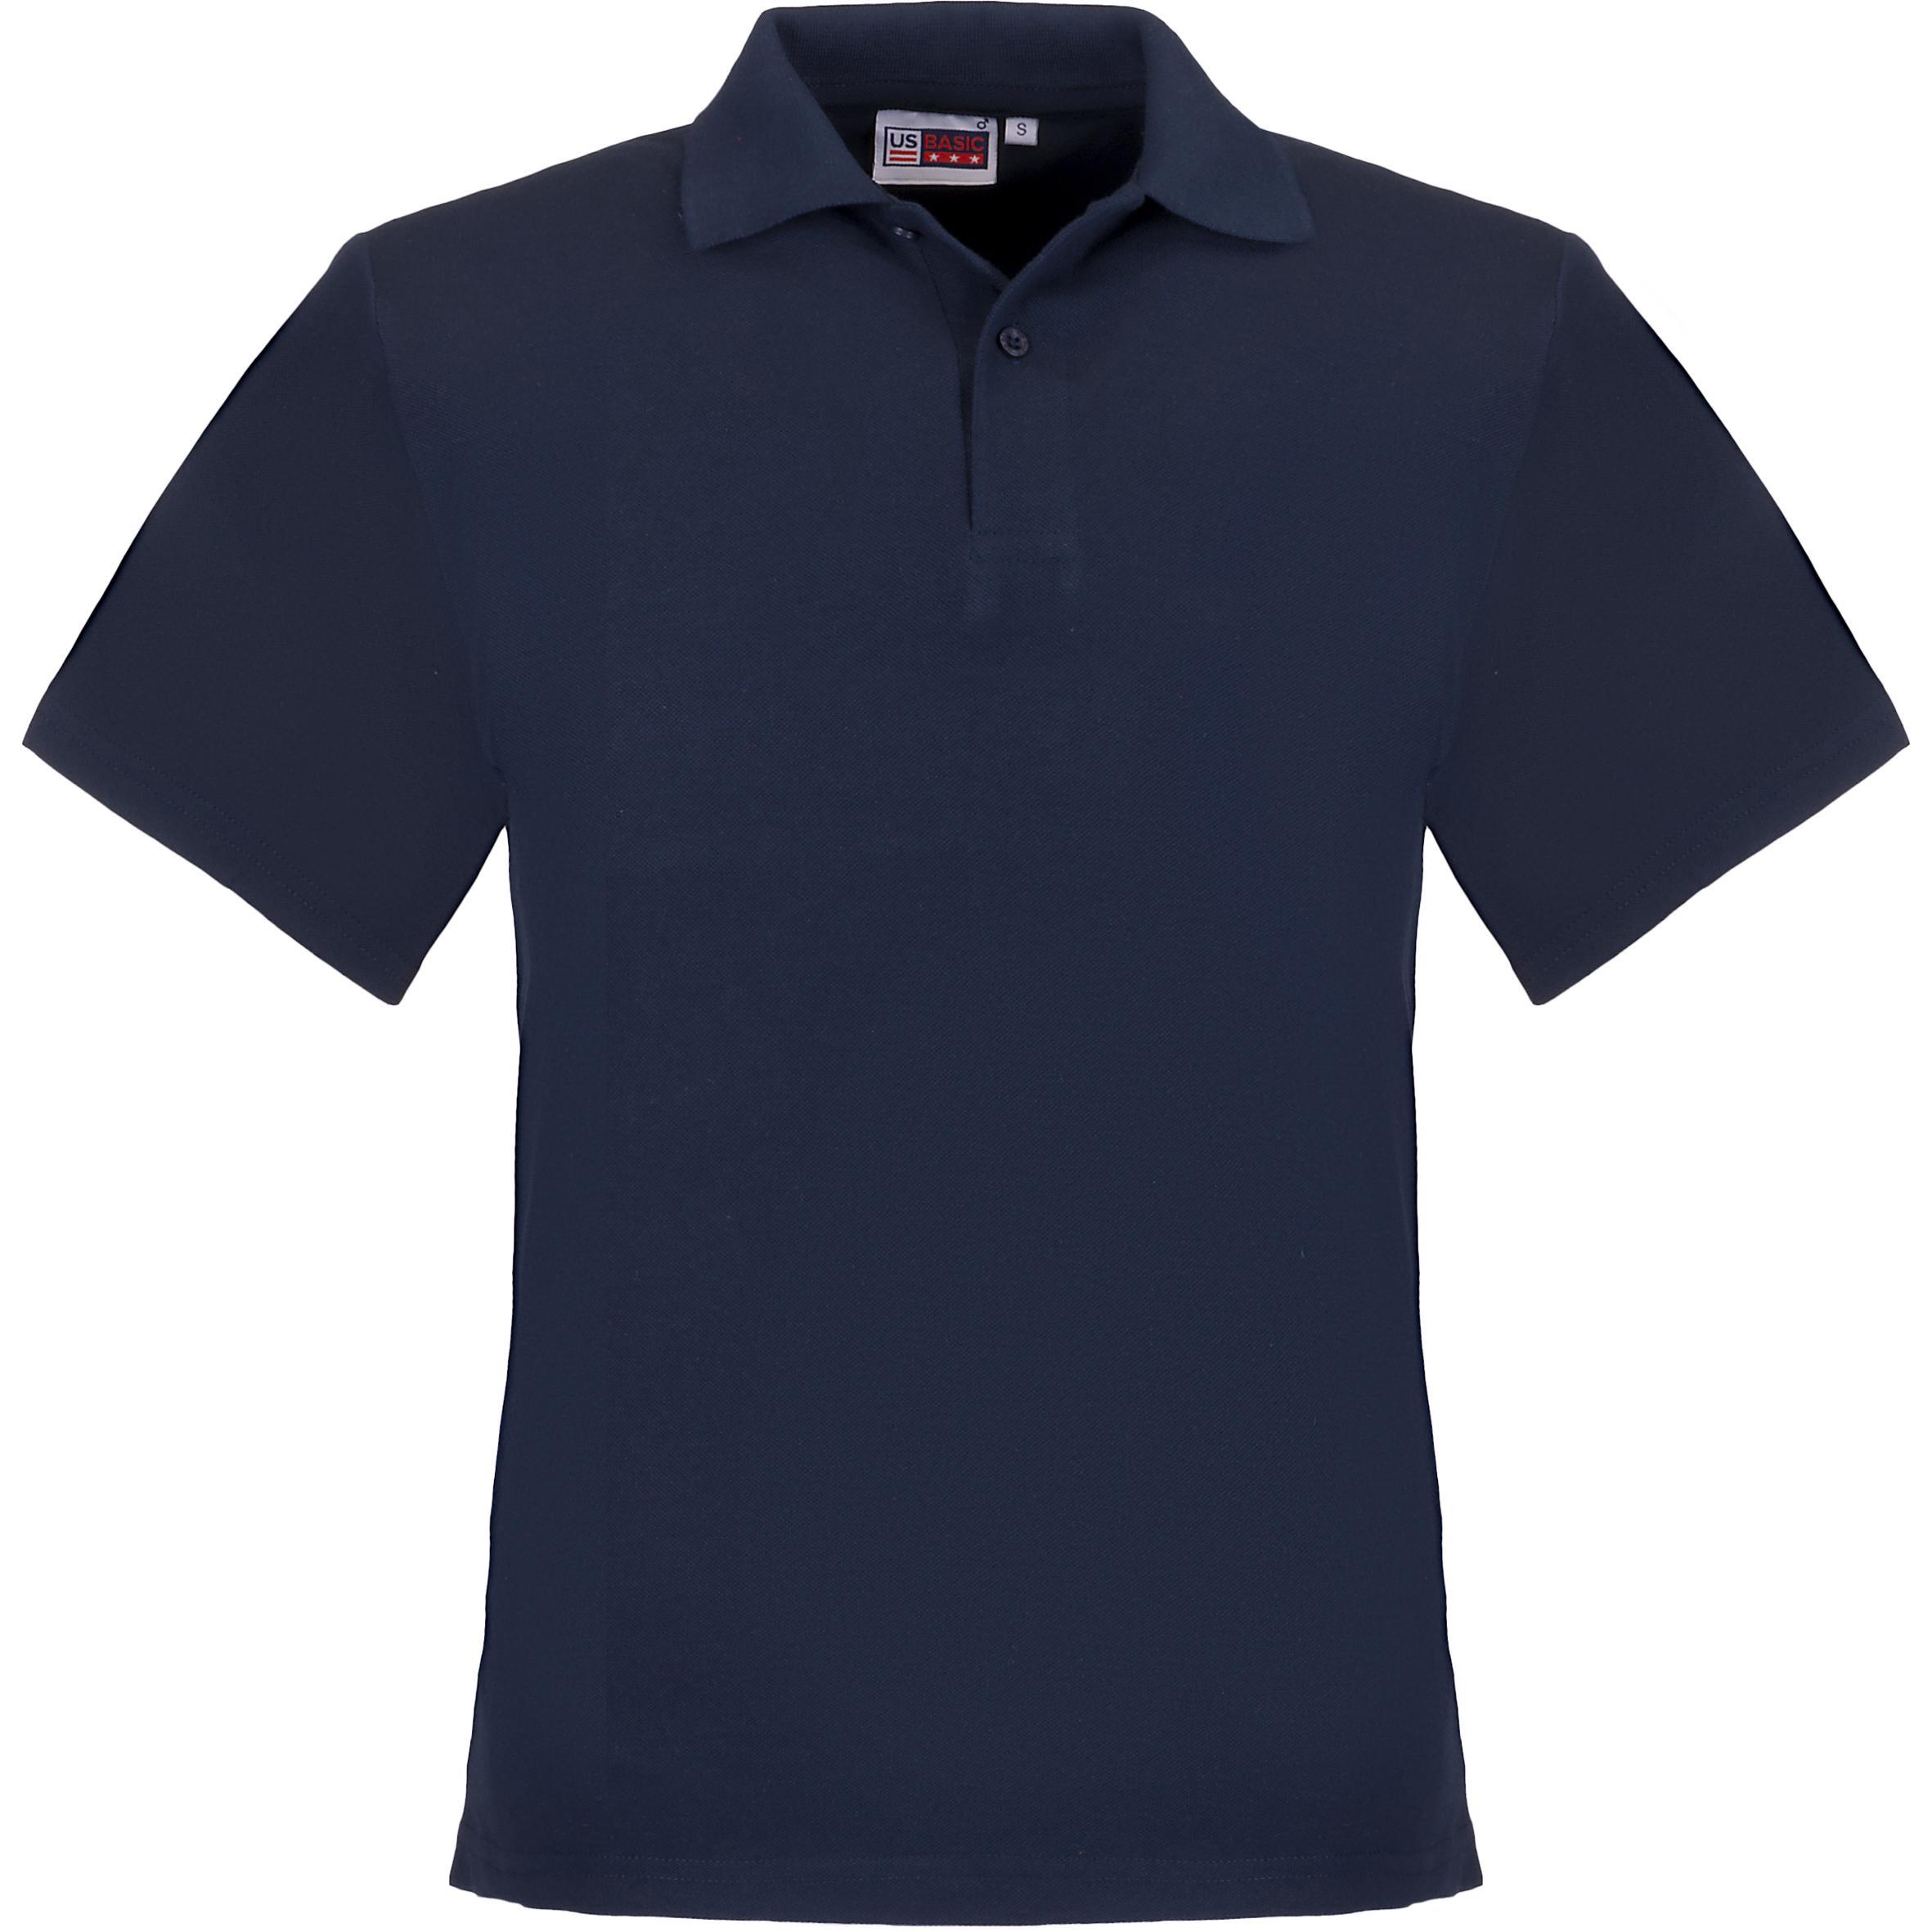 Kids Elemental Golf Shirt - Navy Only